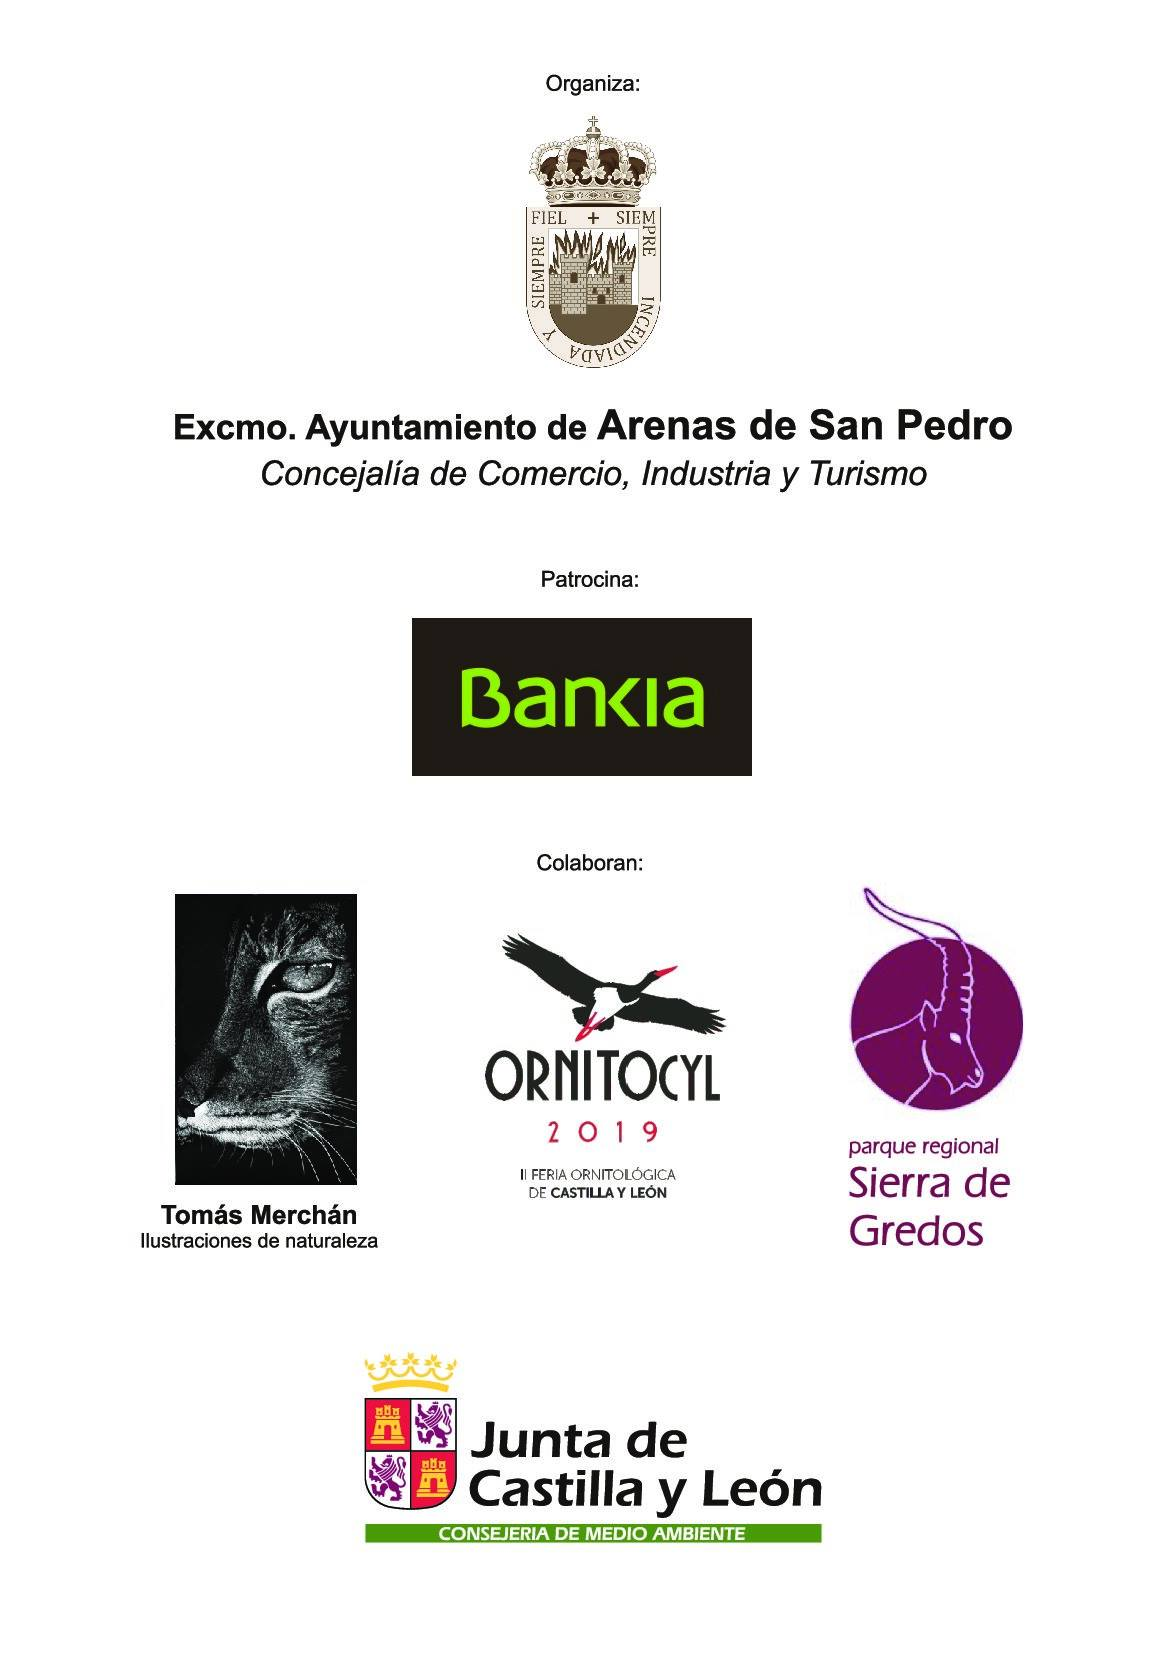 """Las Aves de Gredos"", Ornitología en Arenas de San Pedro - TiétarTeVe"